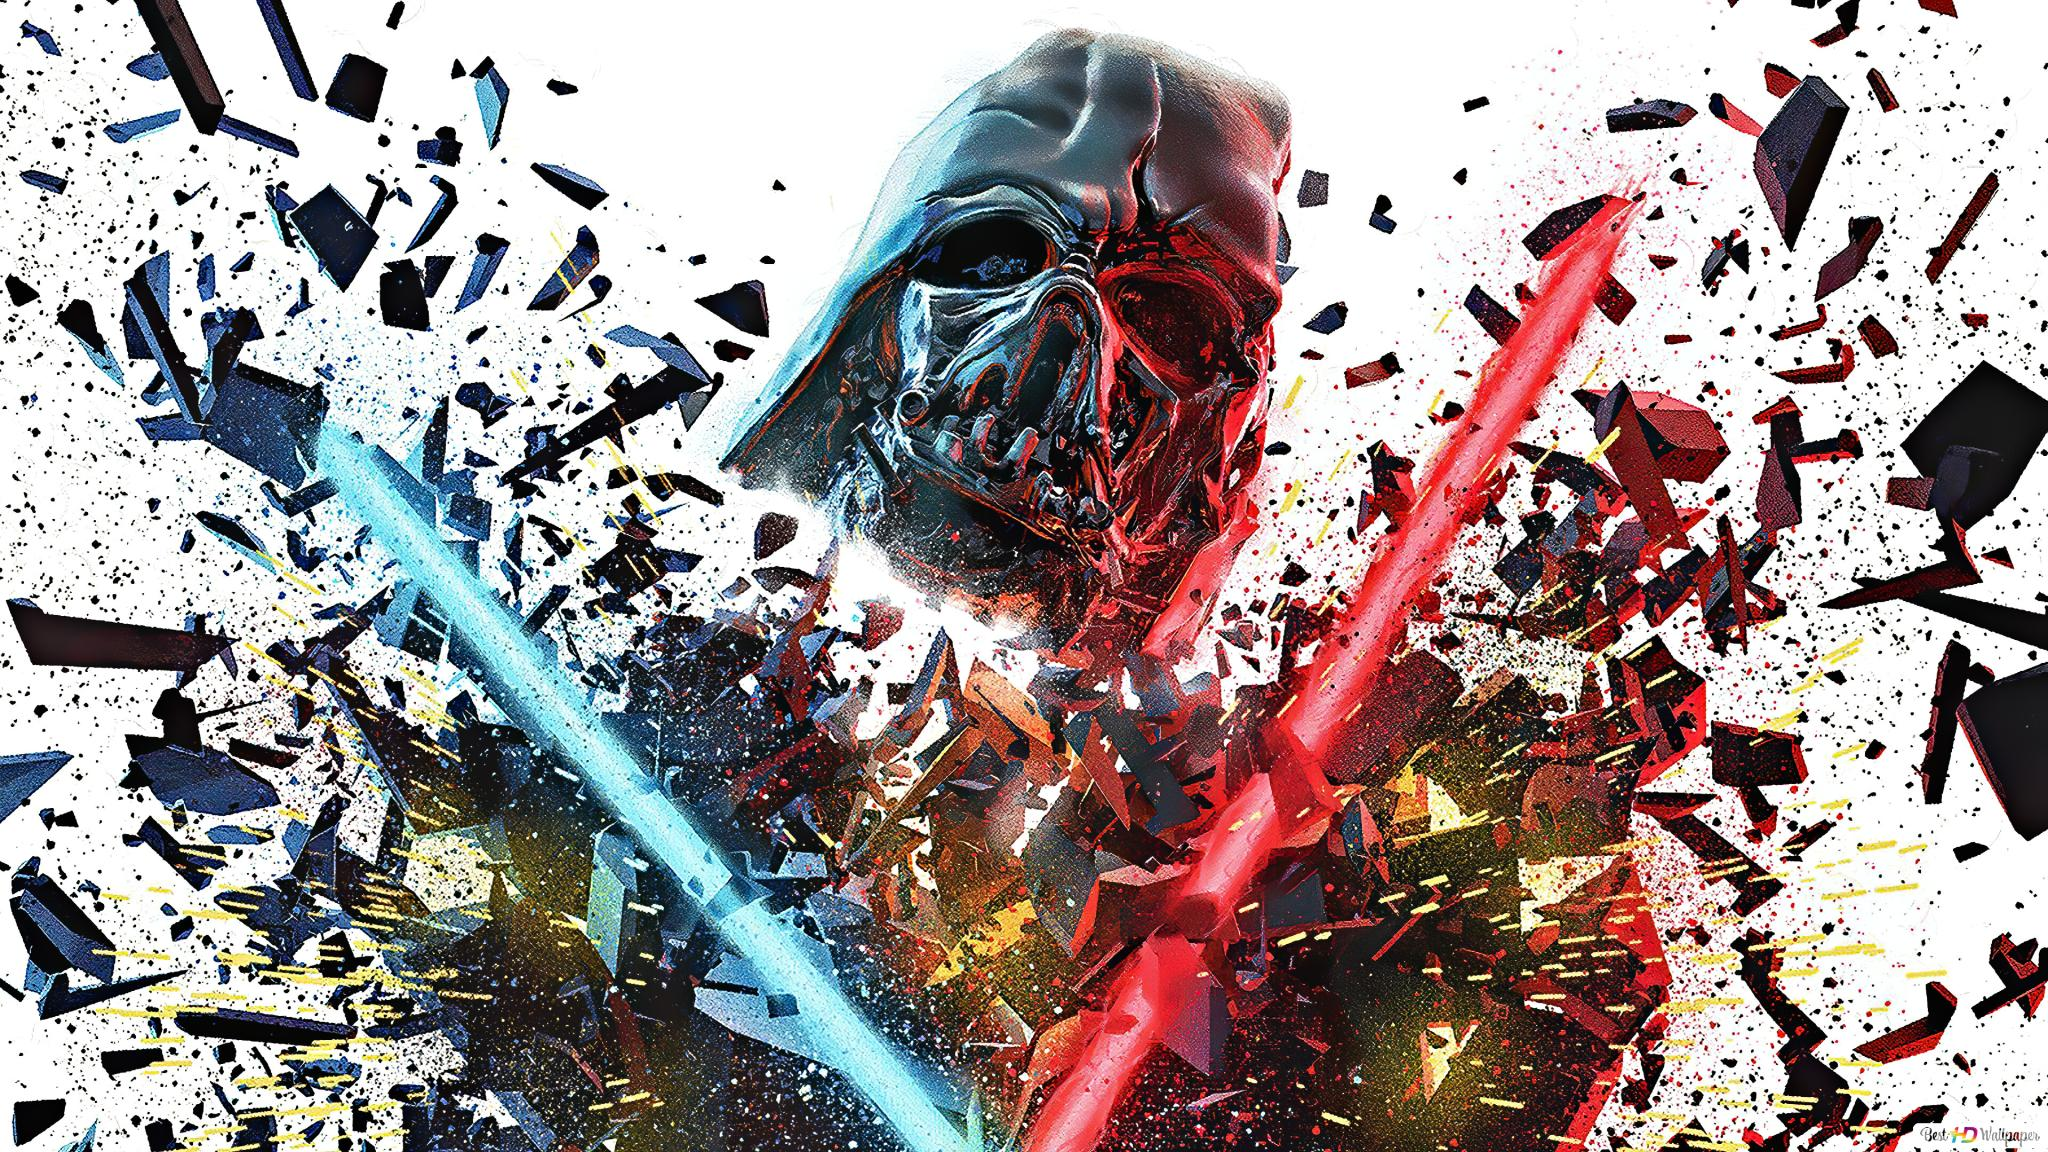 Star Wars Trooper And Lightsaber Hd Wallpaper Download